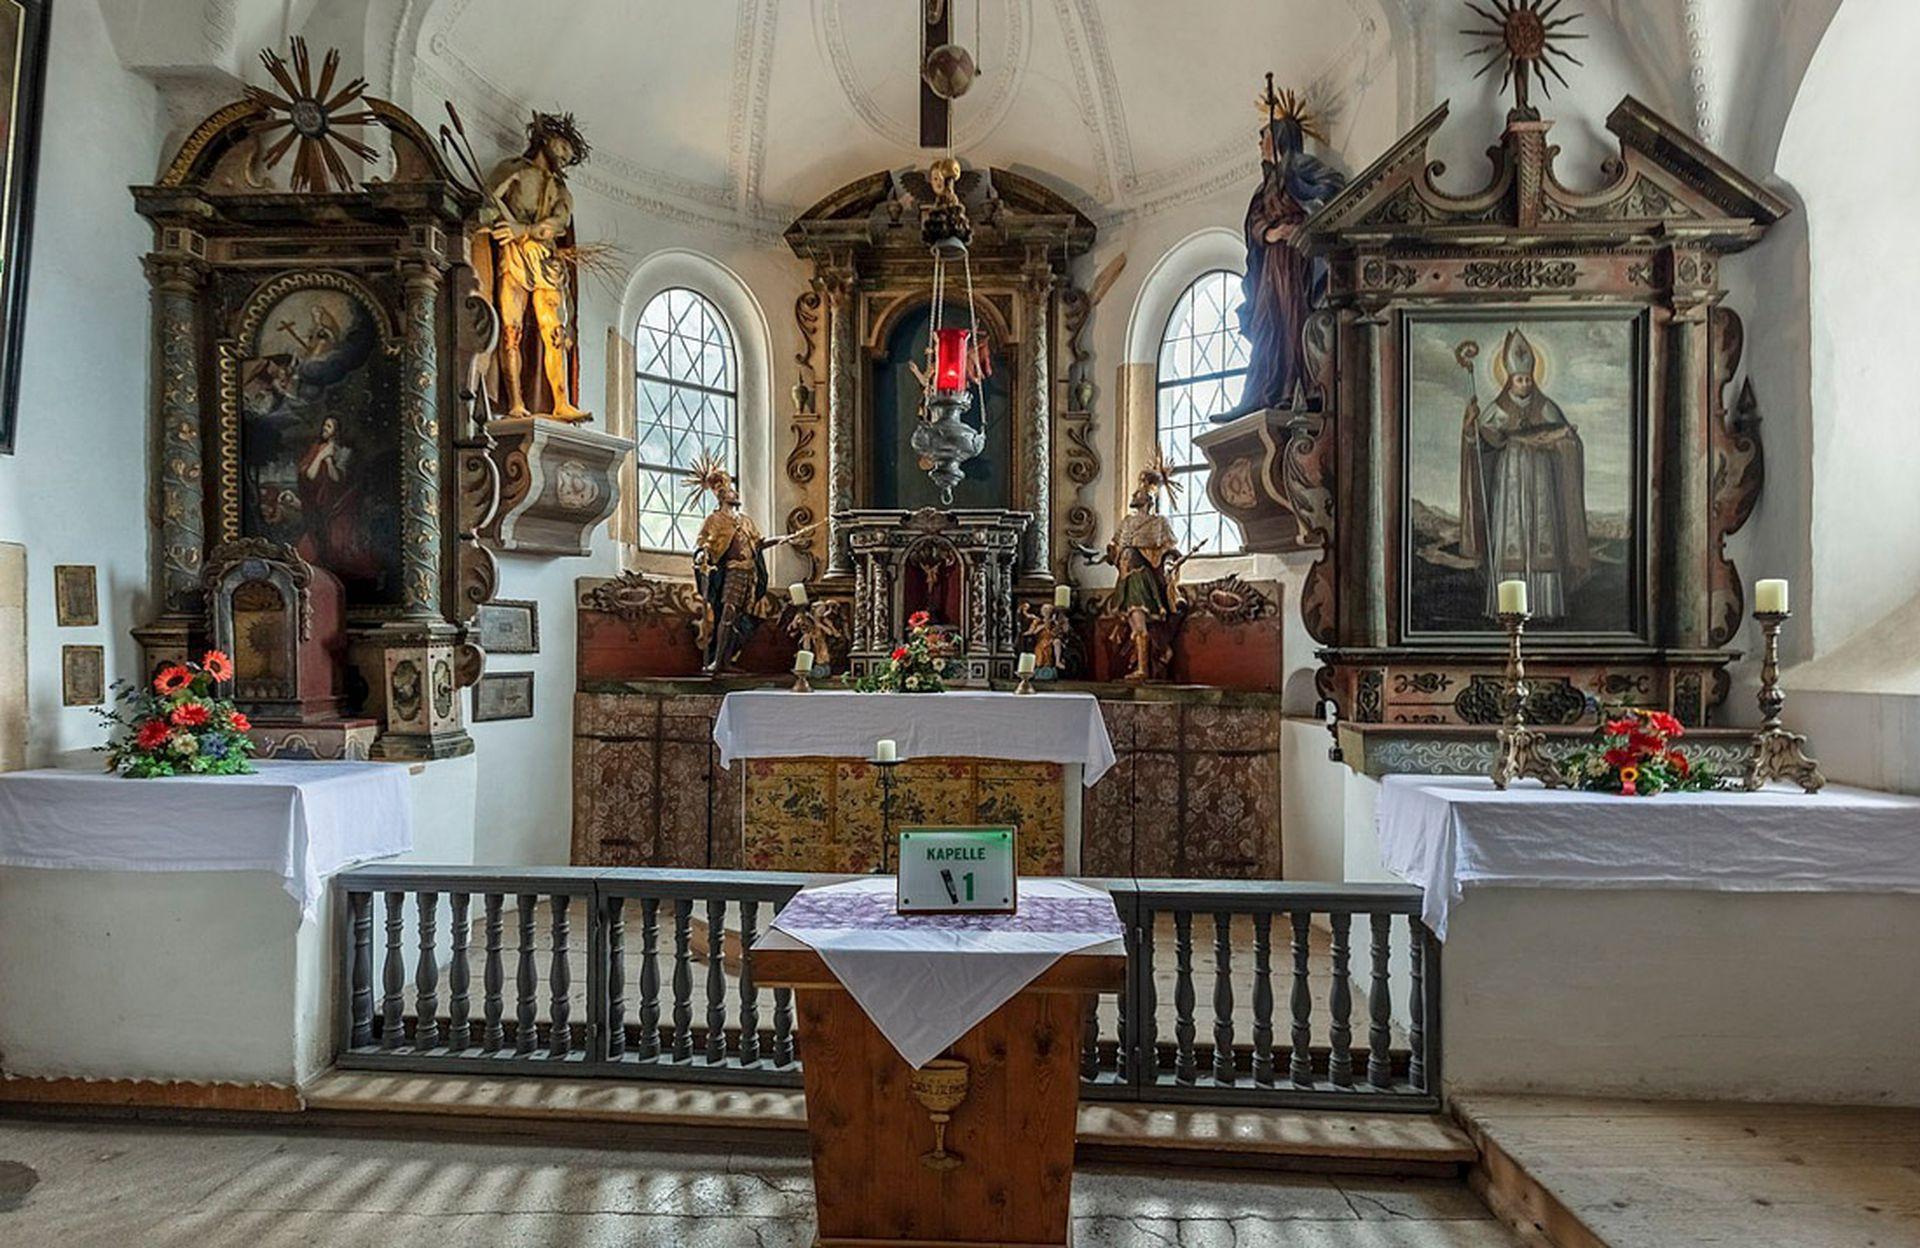 Hohenwerfen tiene una capilla con tesoros de arte sacro.